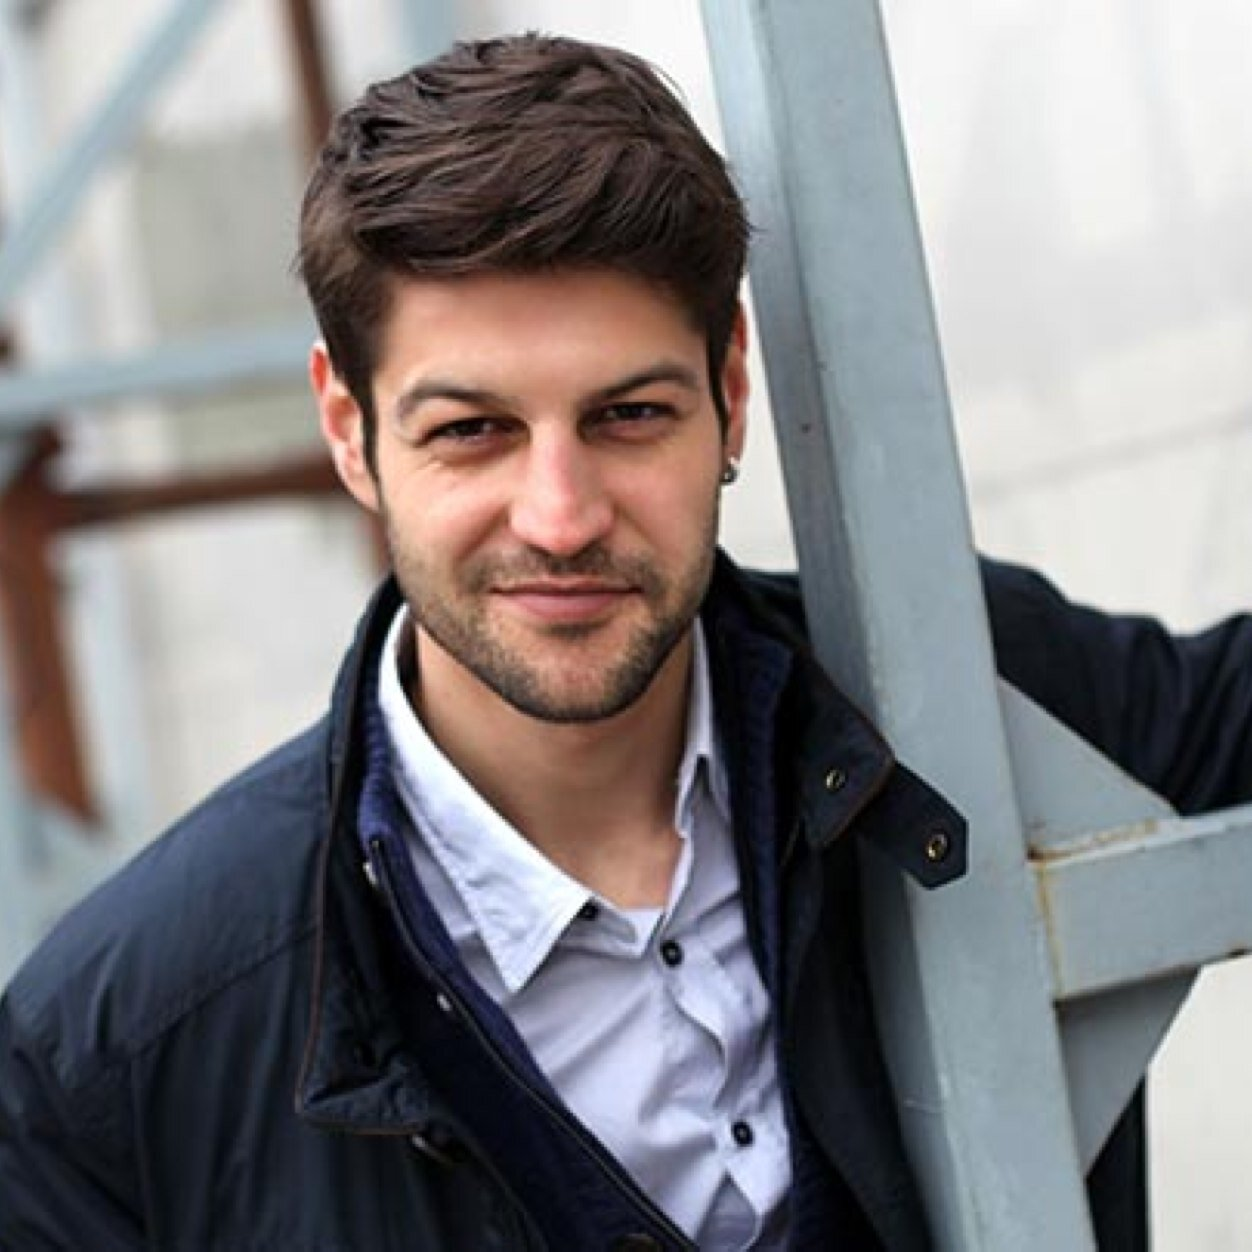 Poze Serhat Teoman - Actor - Poza 2 din 15 - CineMagia.ro